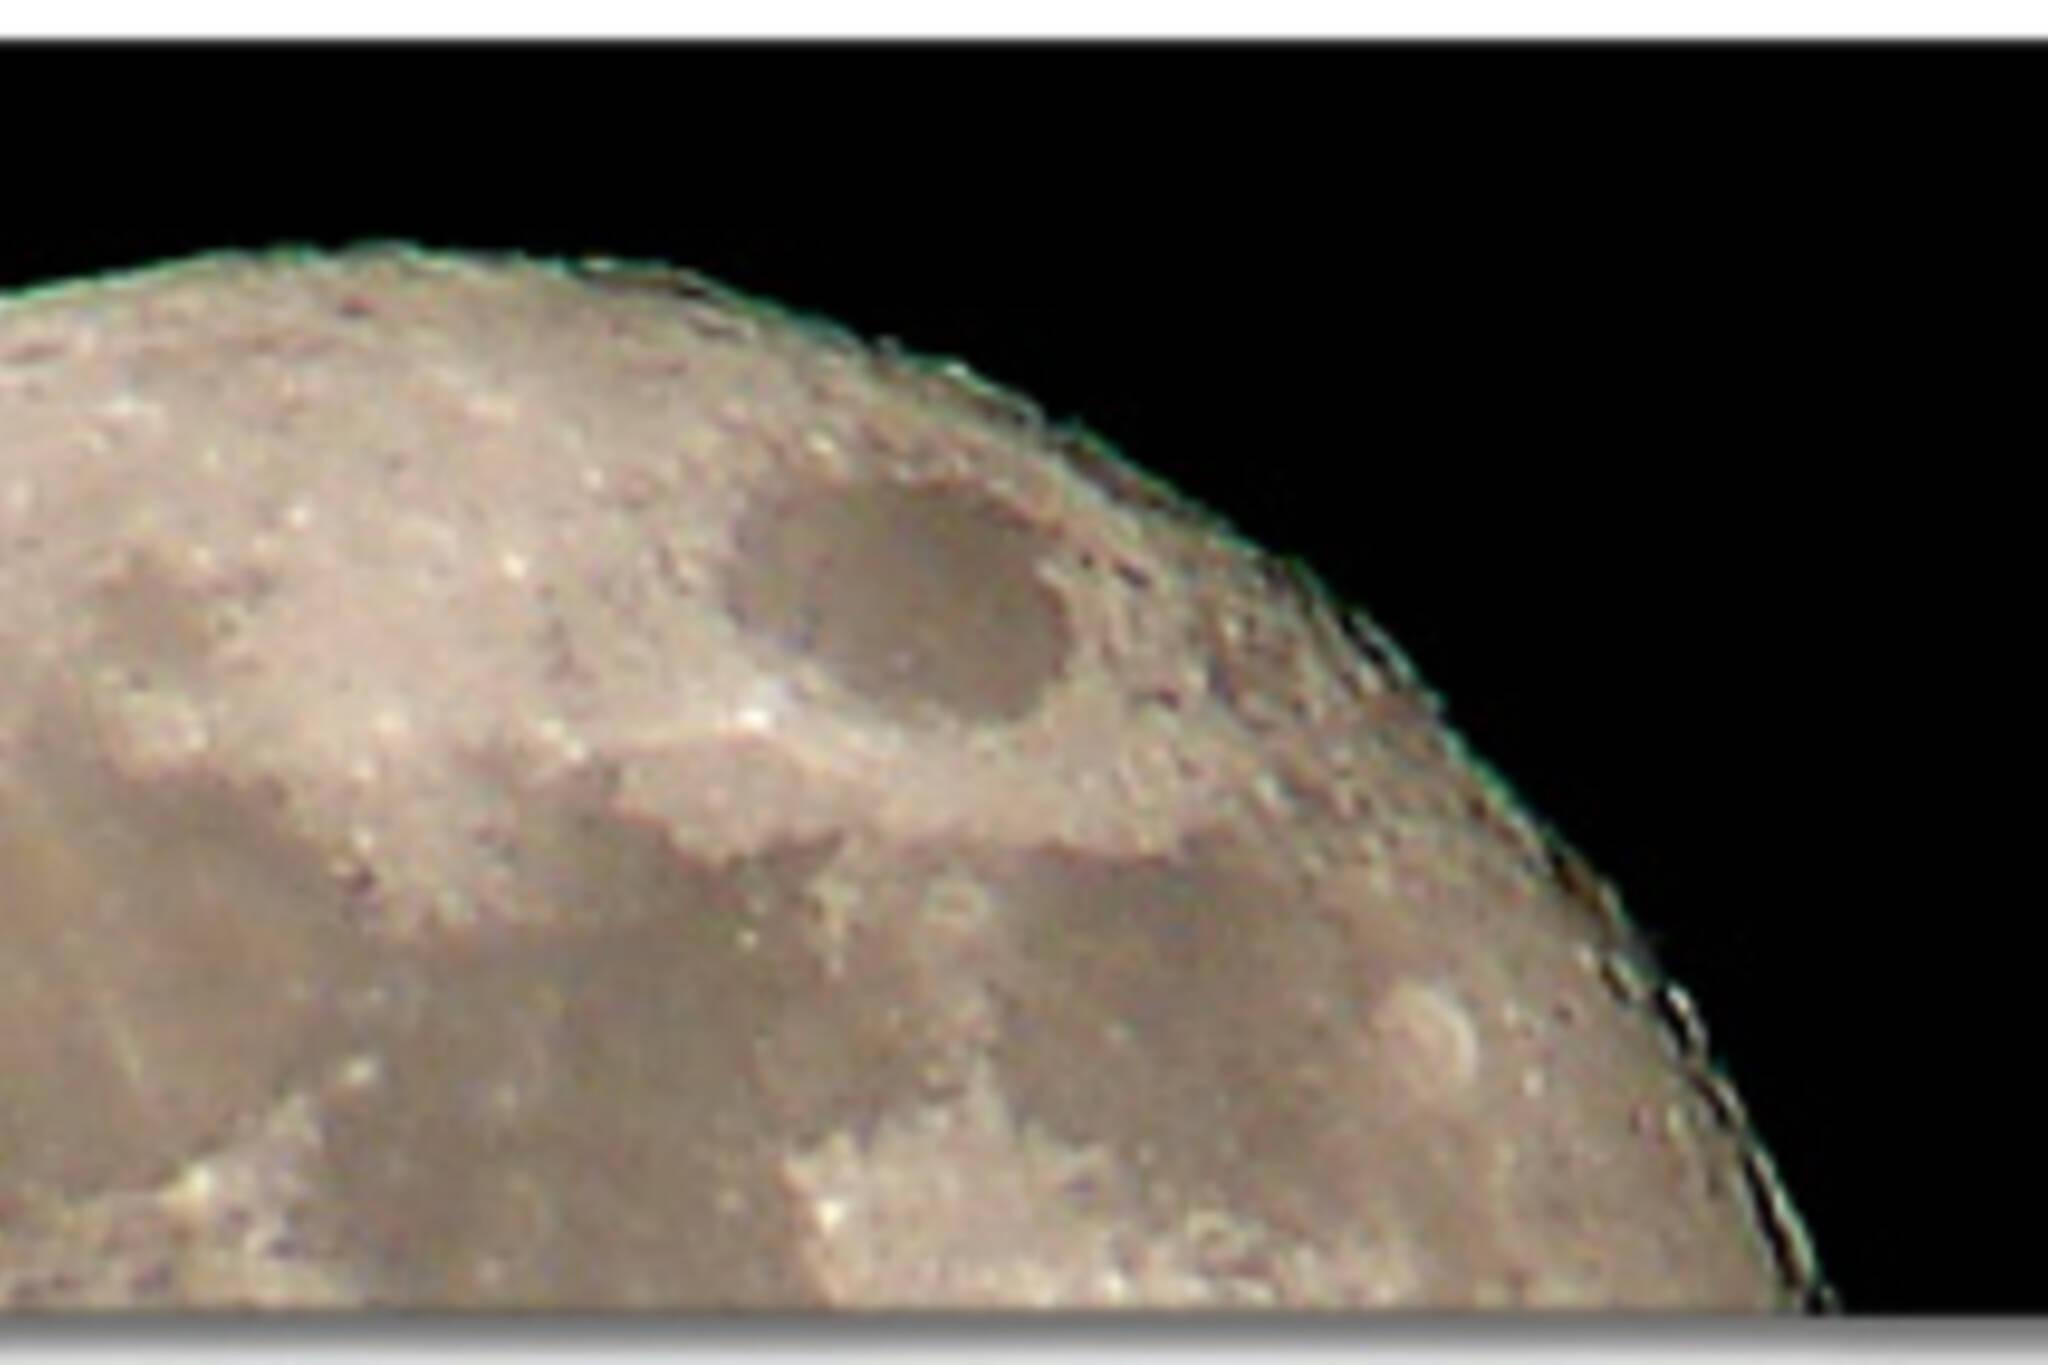 20061206_MBmoon.jpg